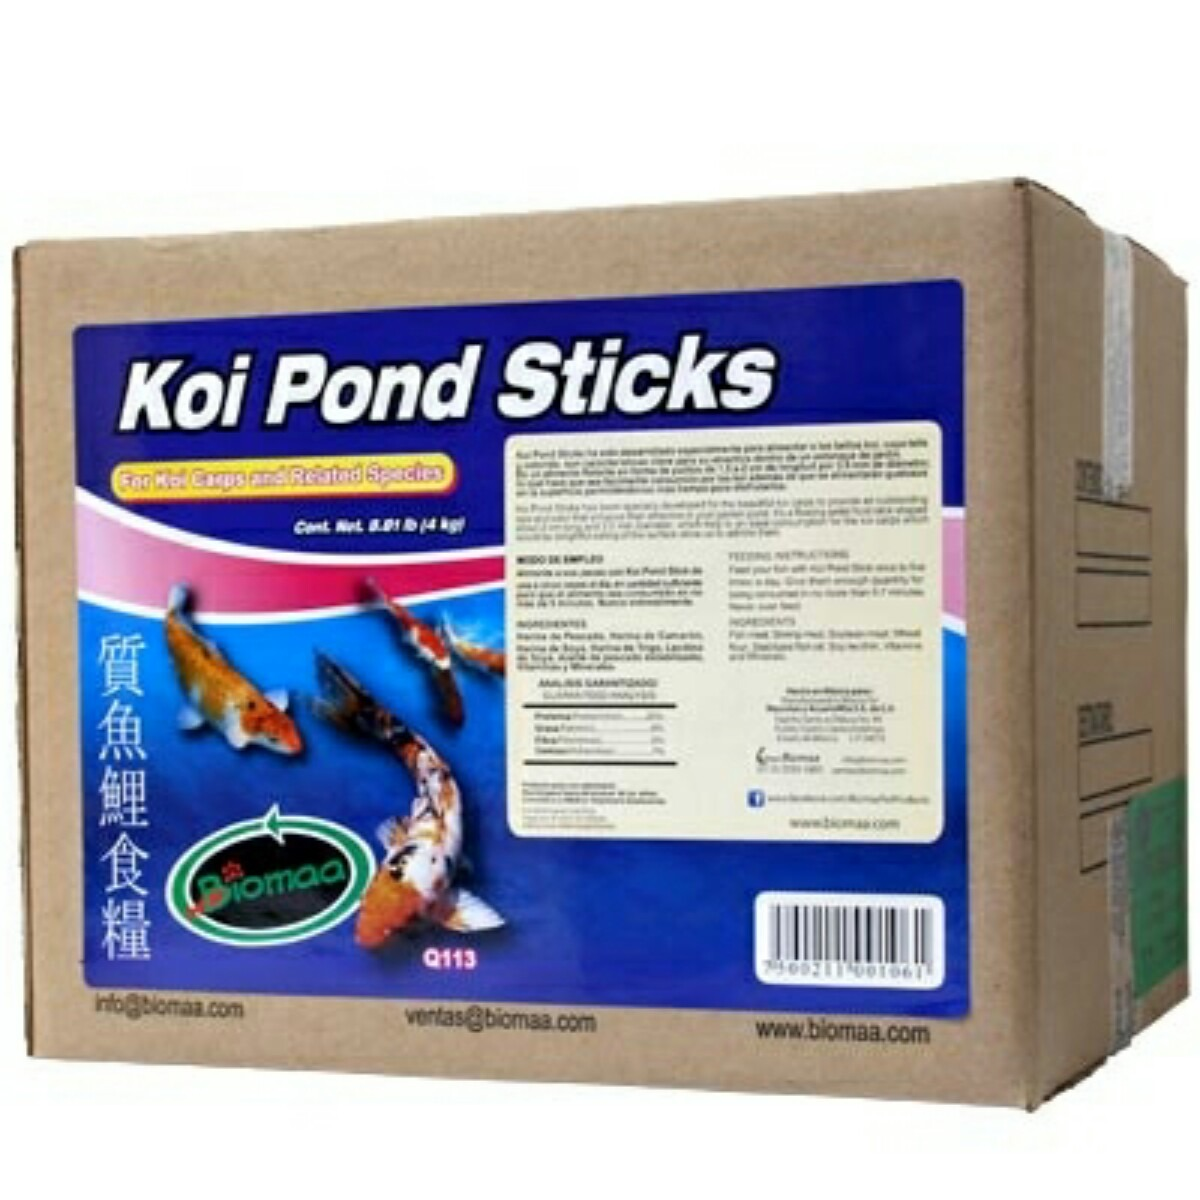 Alimento 20kg para peces de estanque koi pond sticks msi for Alimento peces estanque